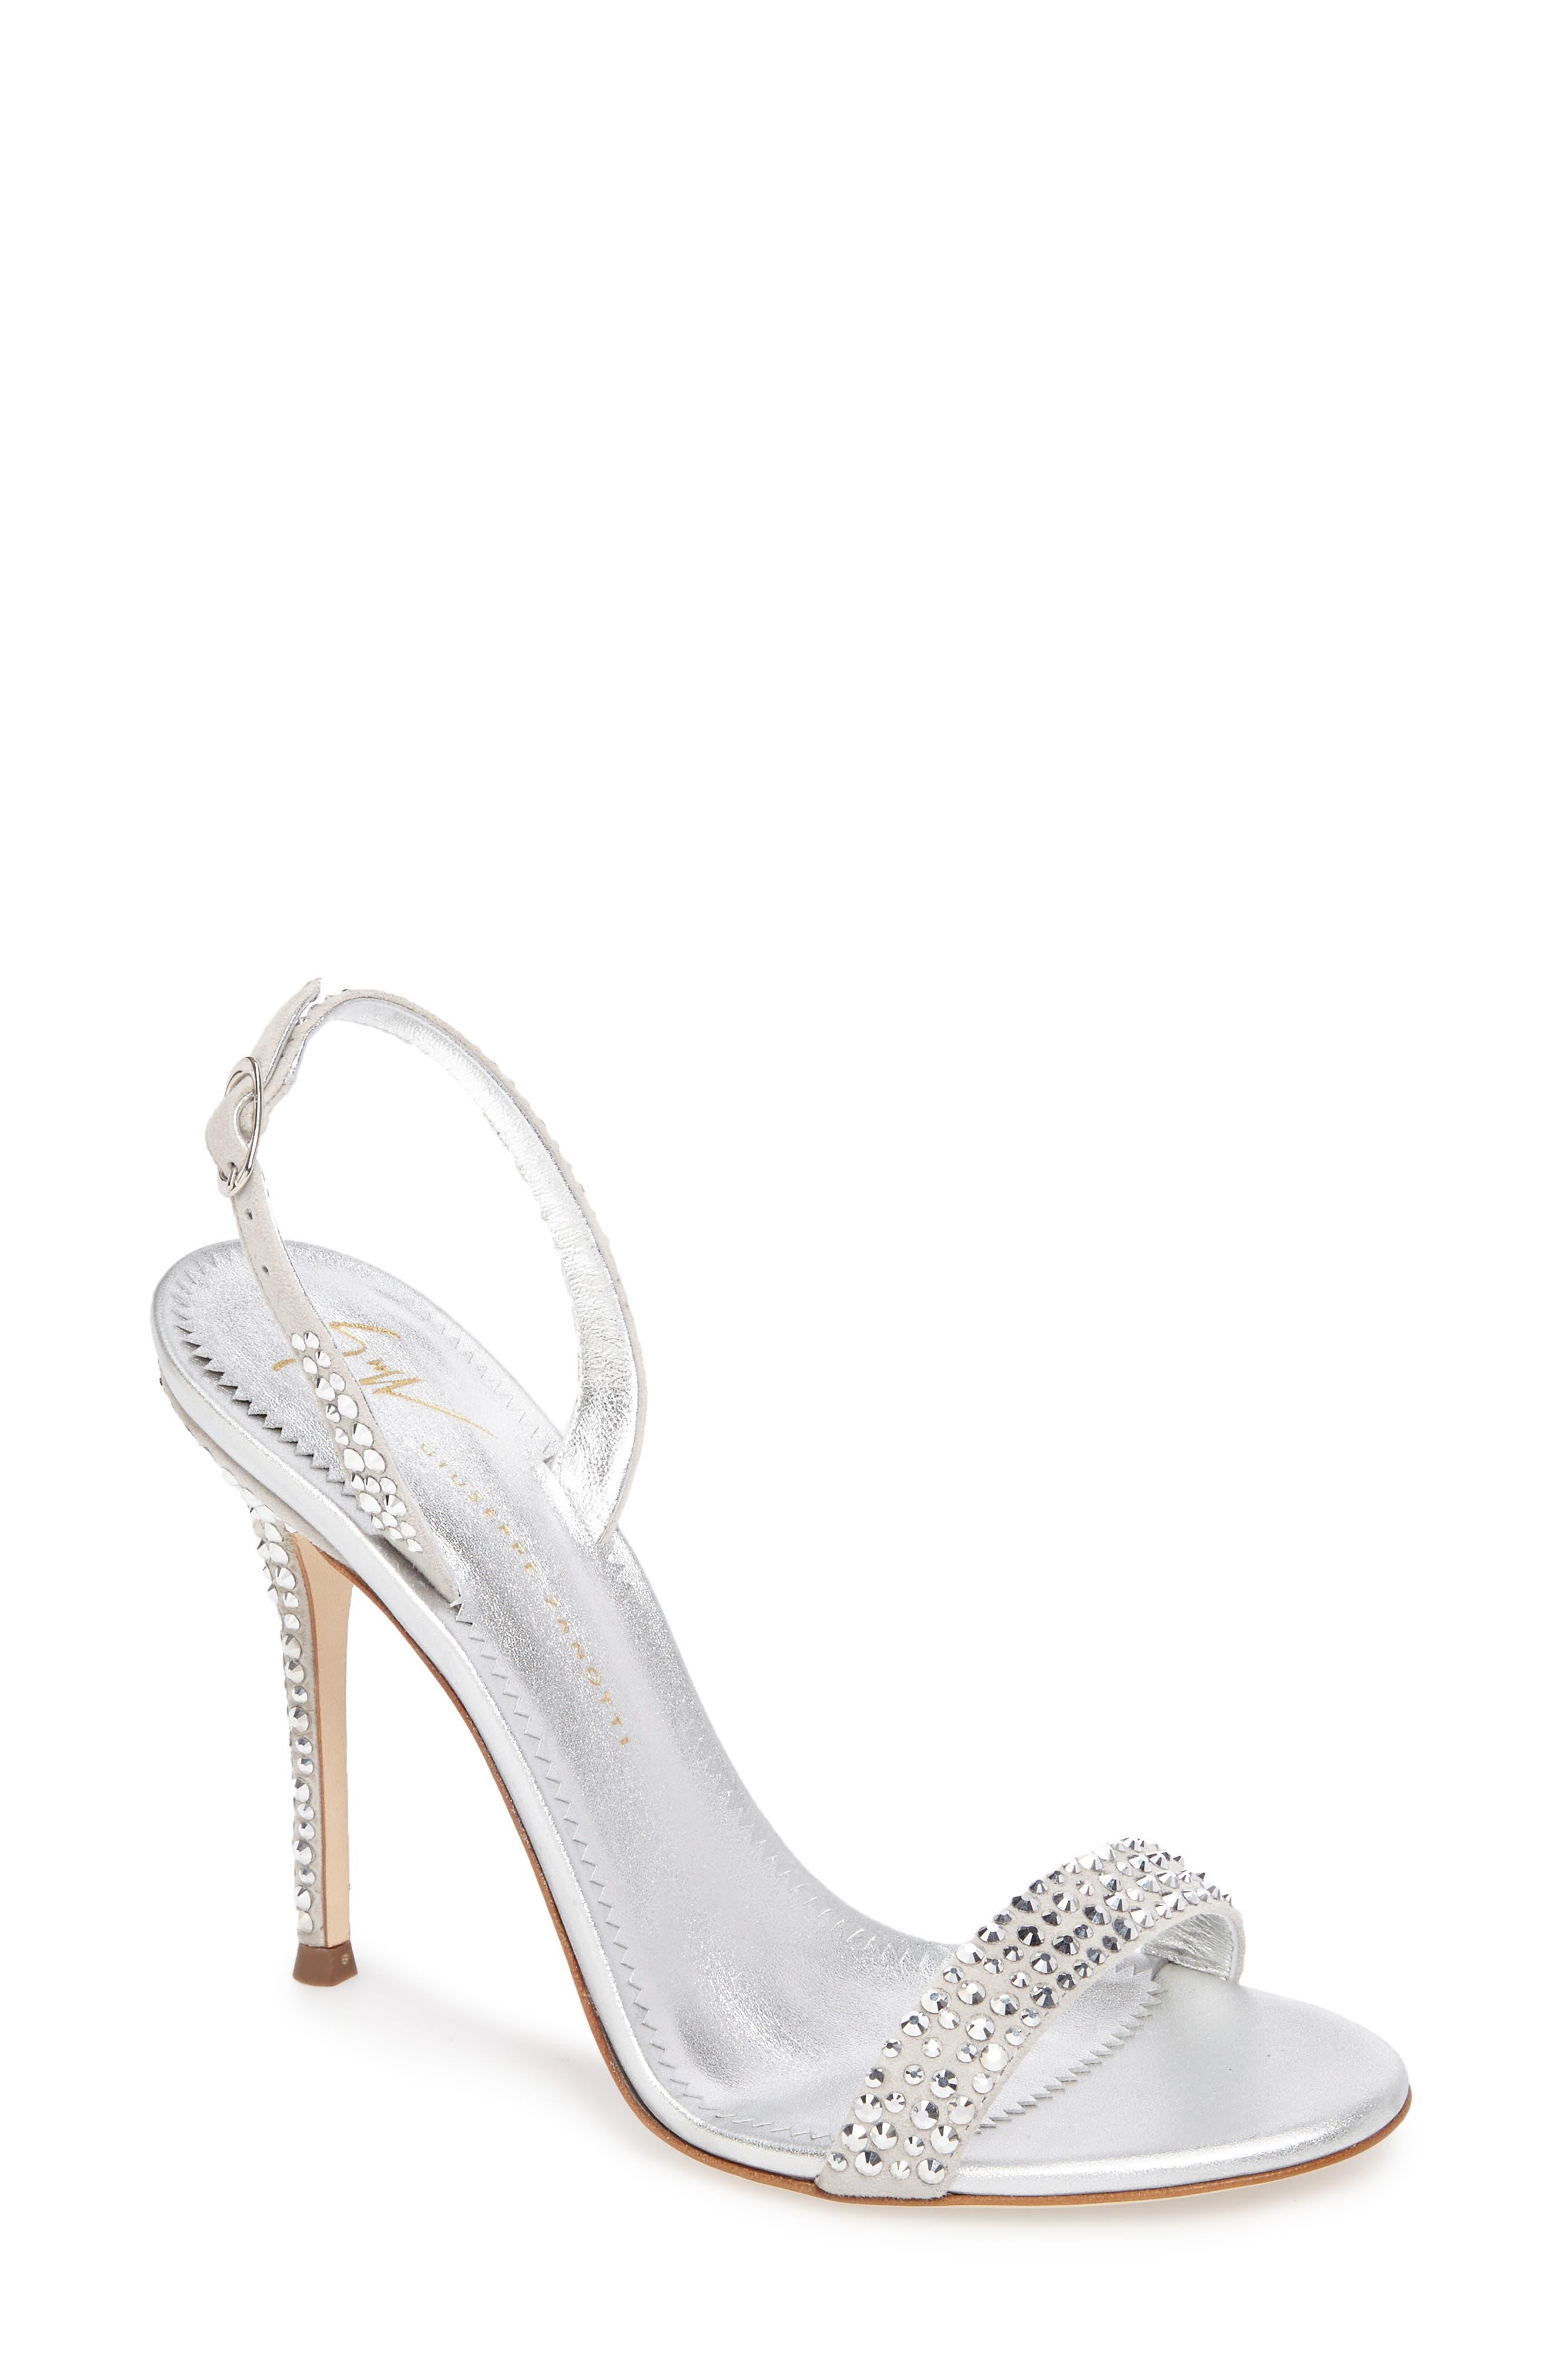 Giuseppe Zanotti Musitco Crystal Embellished Slingback Sandal (Women)